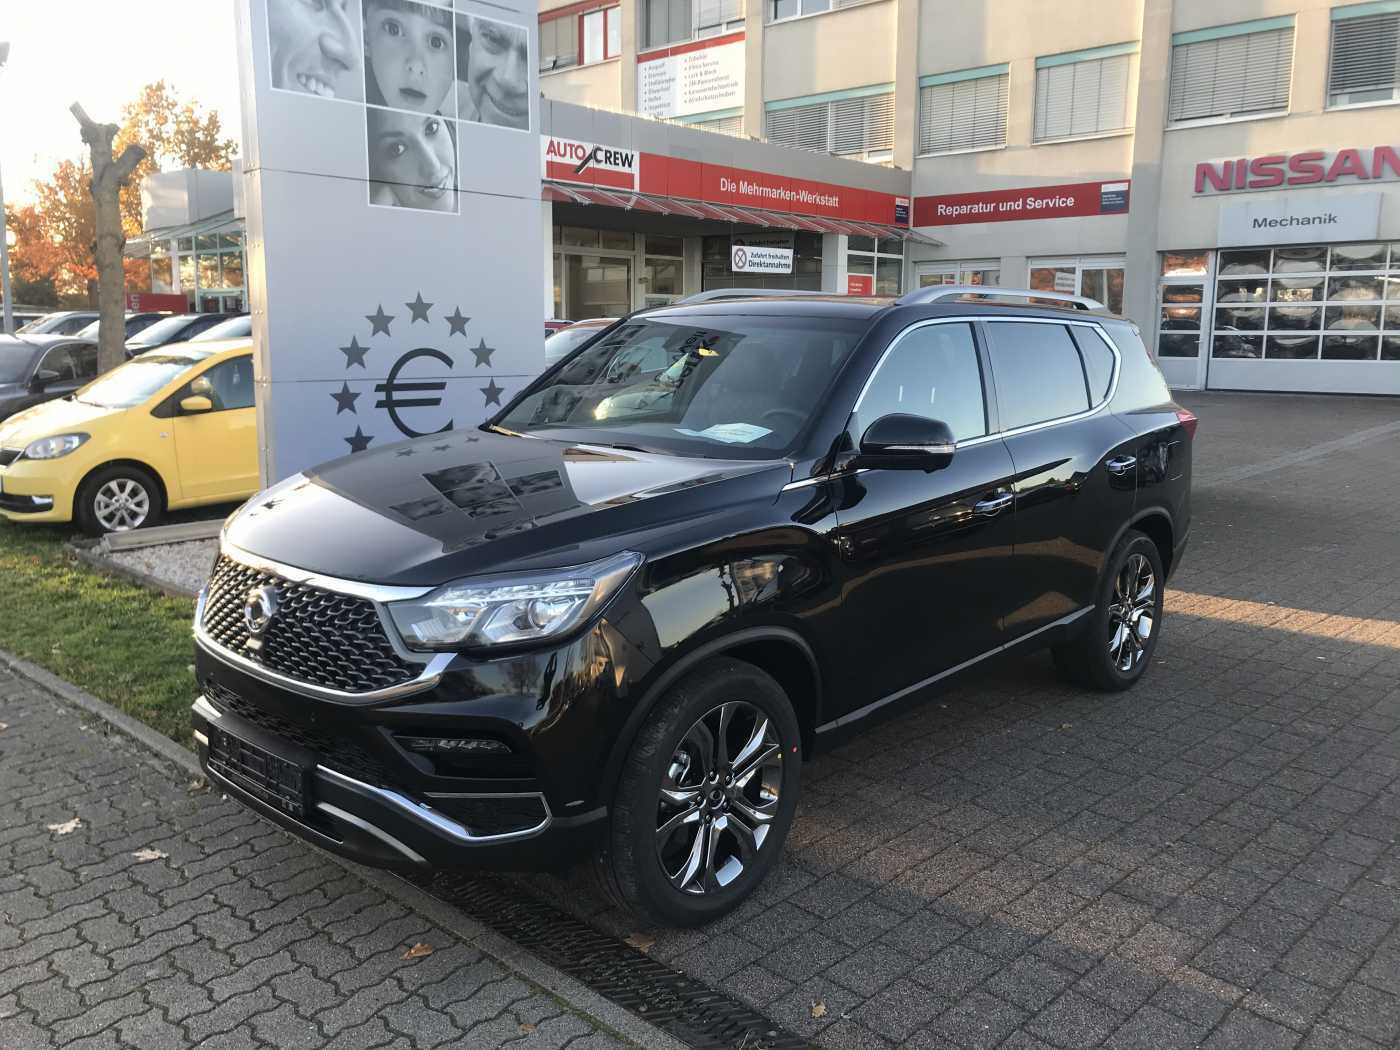 Ssangyong Rexton 2.2 e-XDi 4WD Aut. Sapphire *MJ20*, Jahr 2019, Diesel